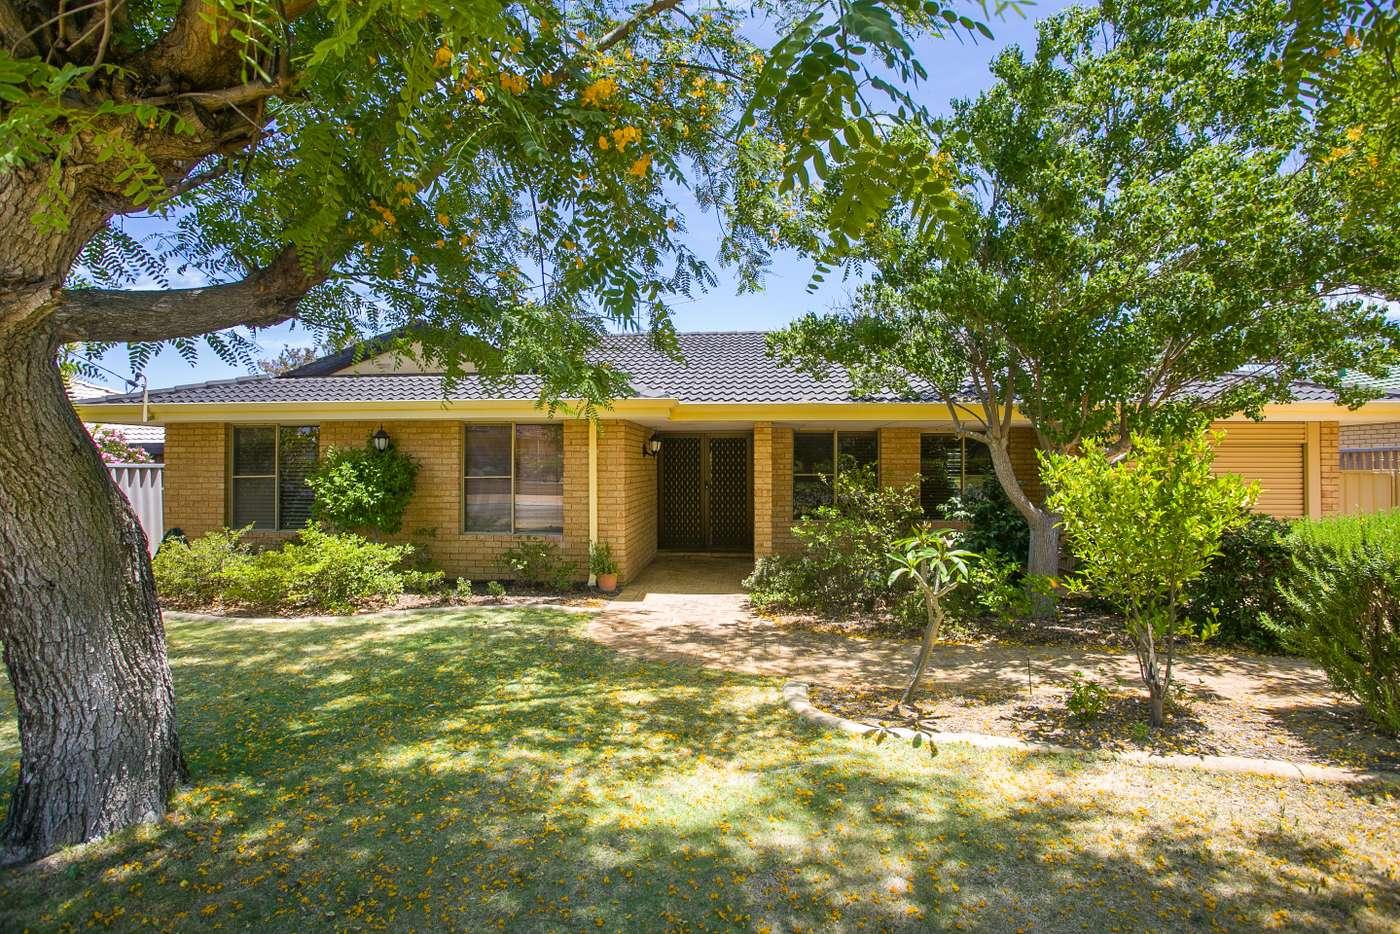 Main view of Homely house listing, 30 Sapling Way, Hocking WA 6065